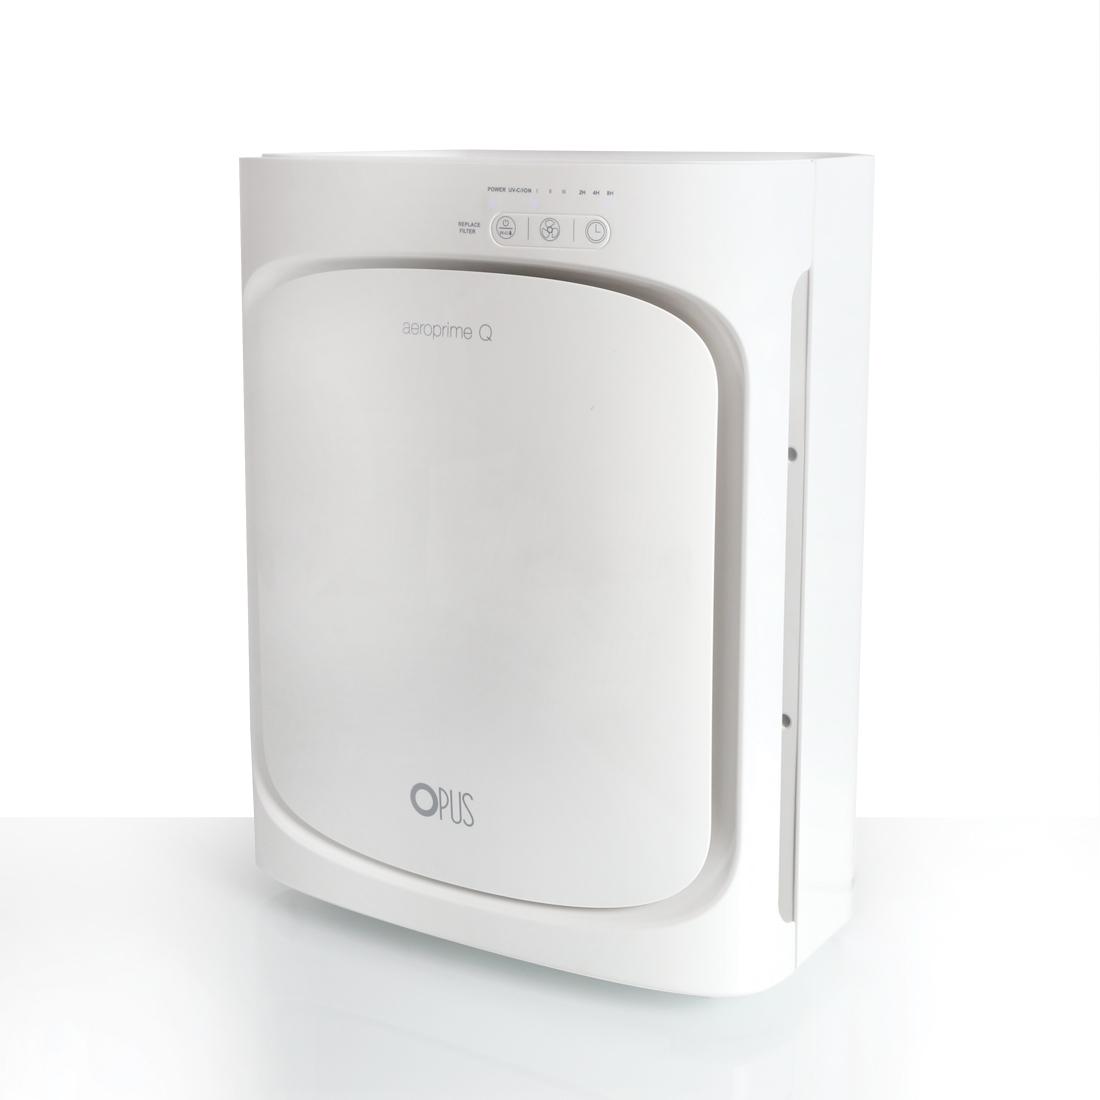 Čistička vzduchu OPUS Aeroprime Q